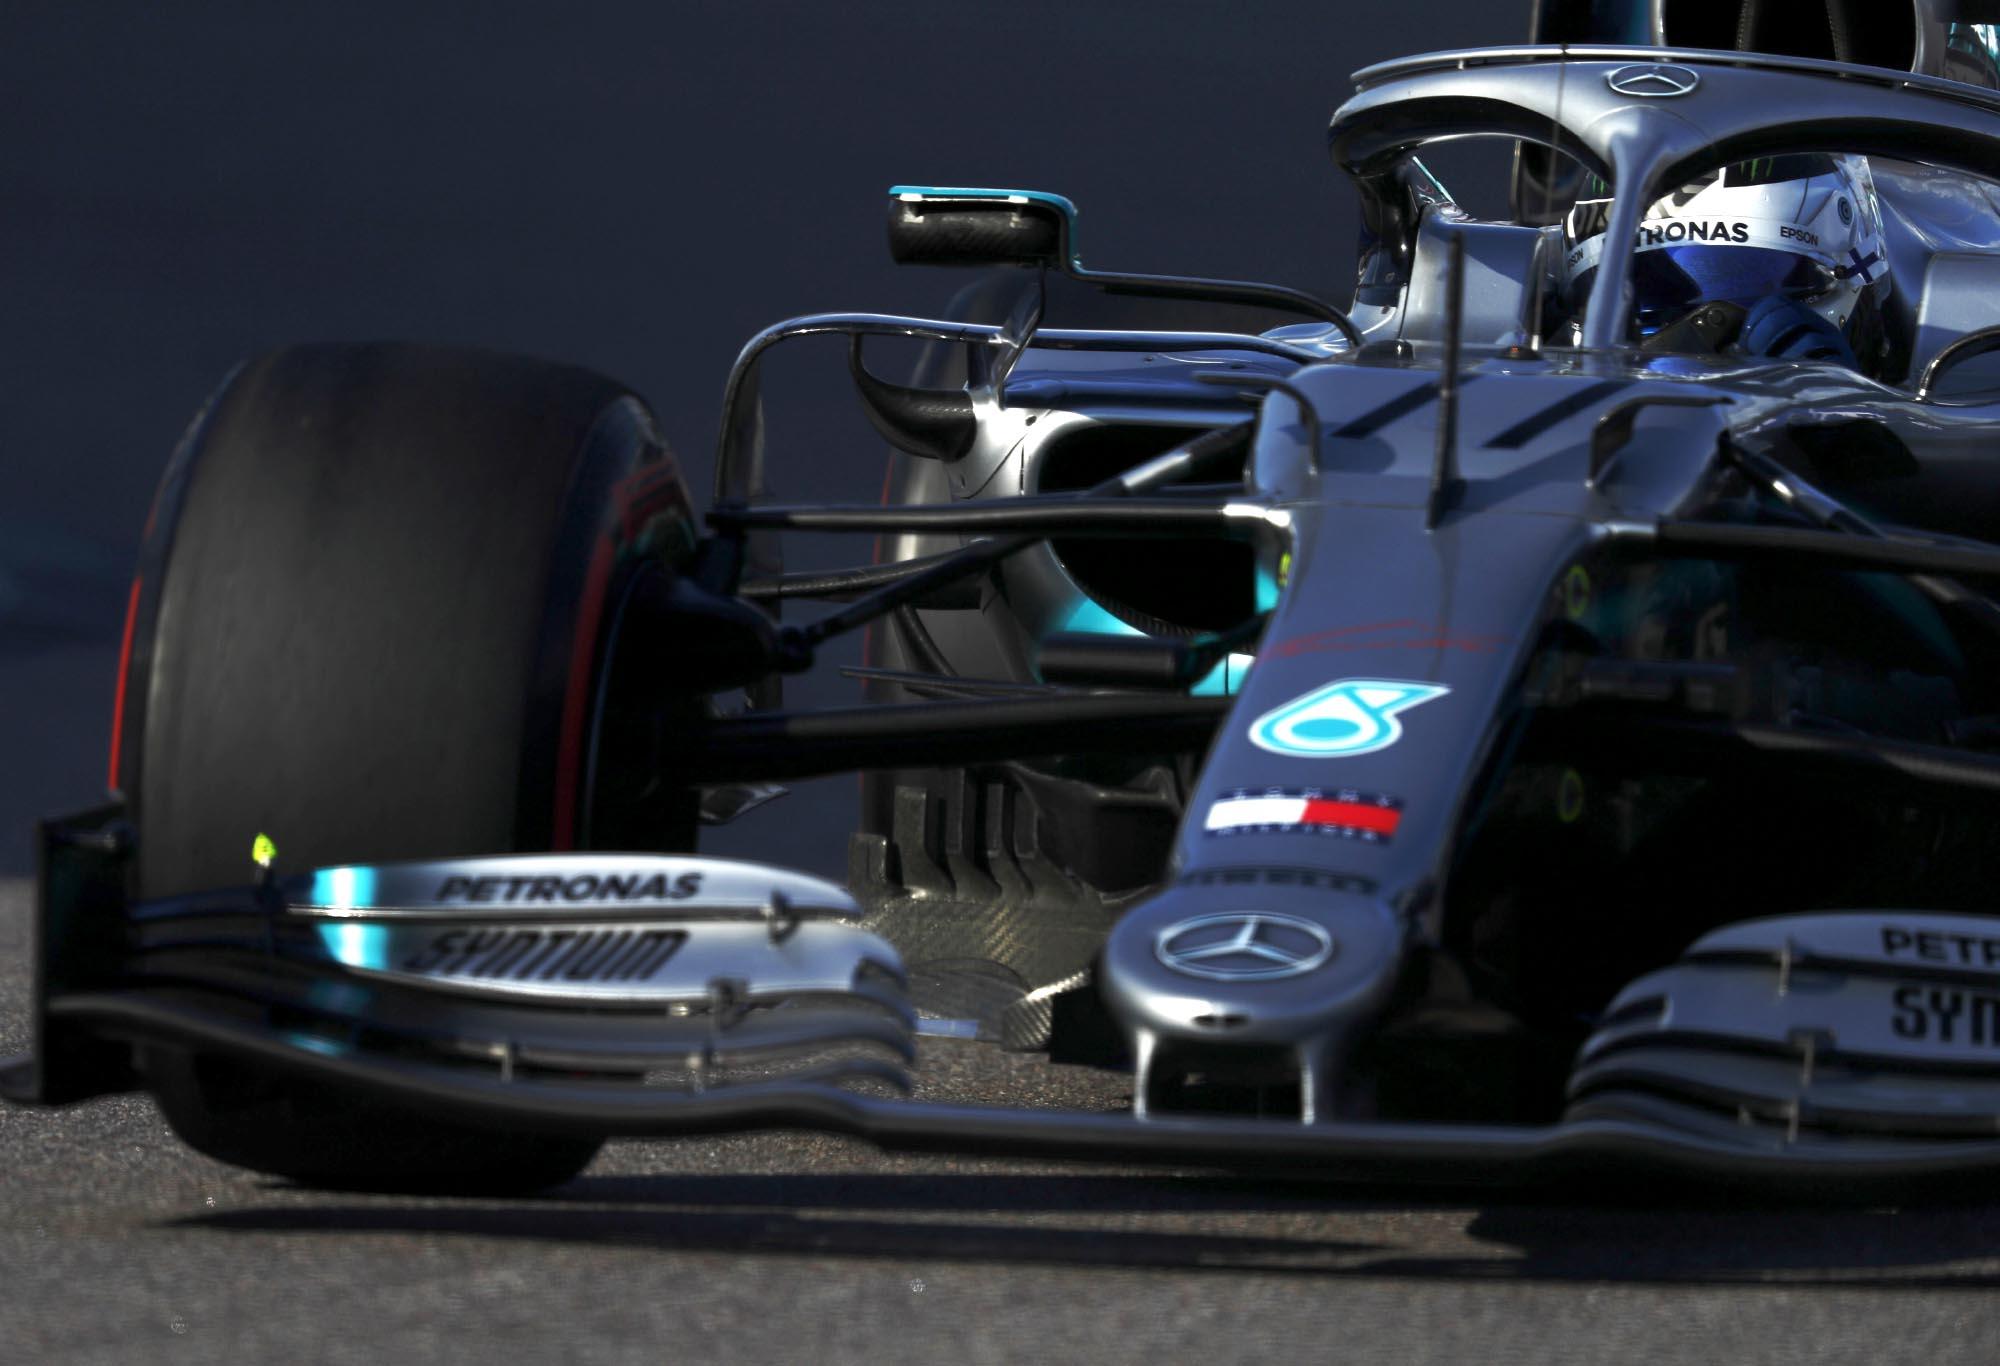 Valtteri Bottas on track in his Mercede